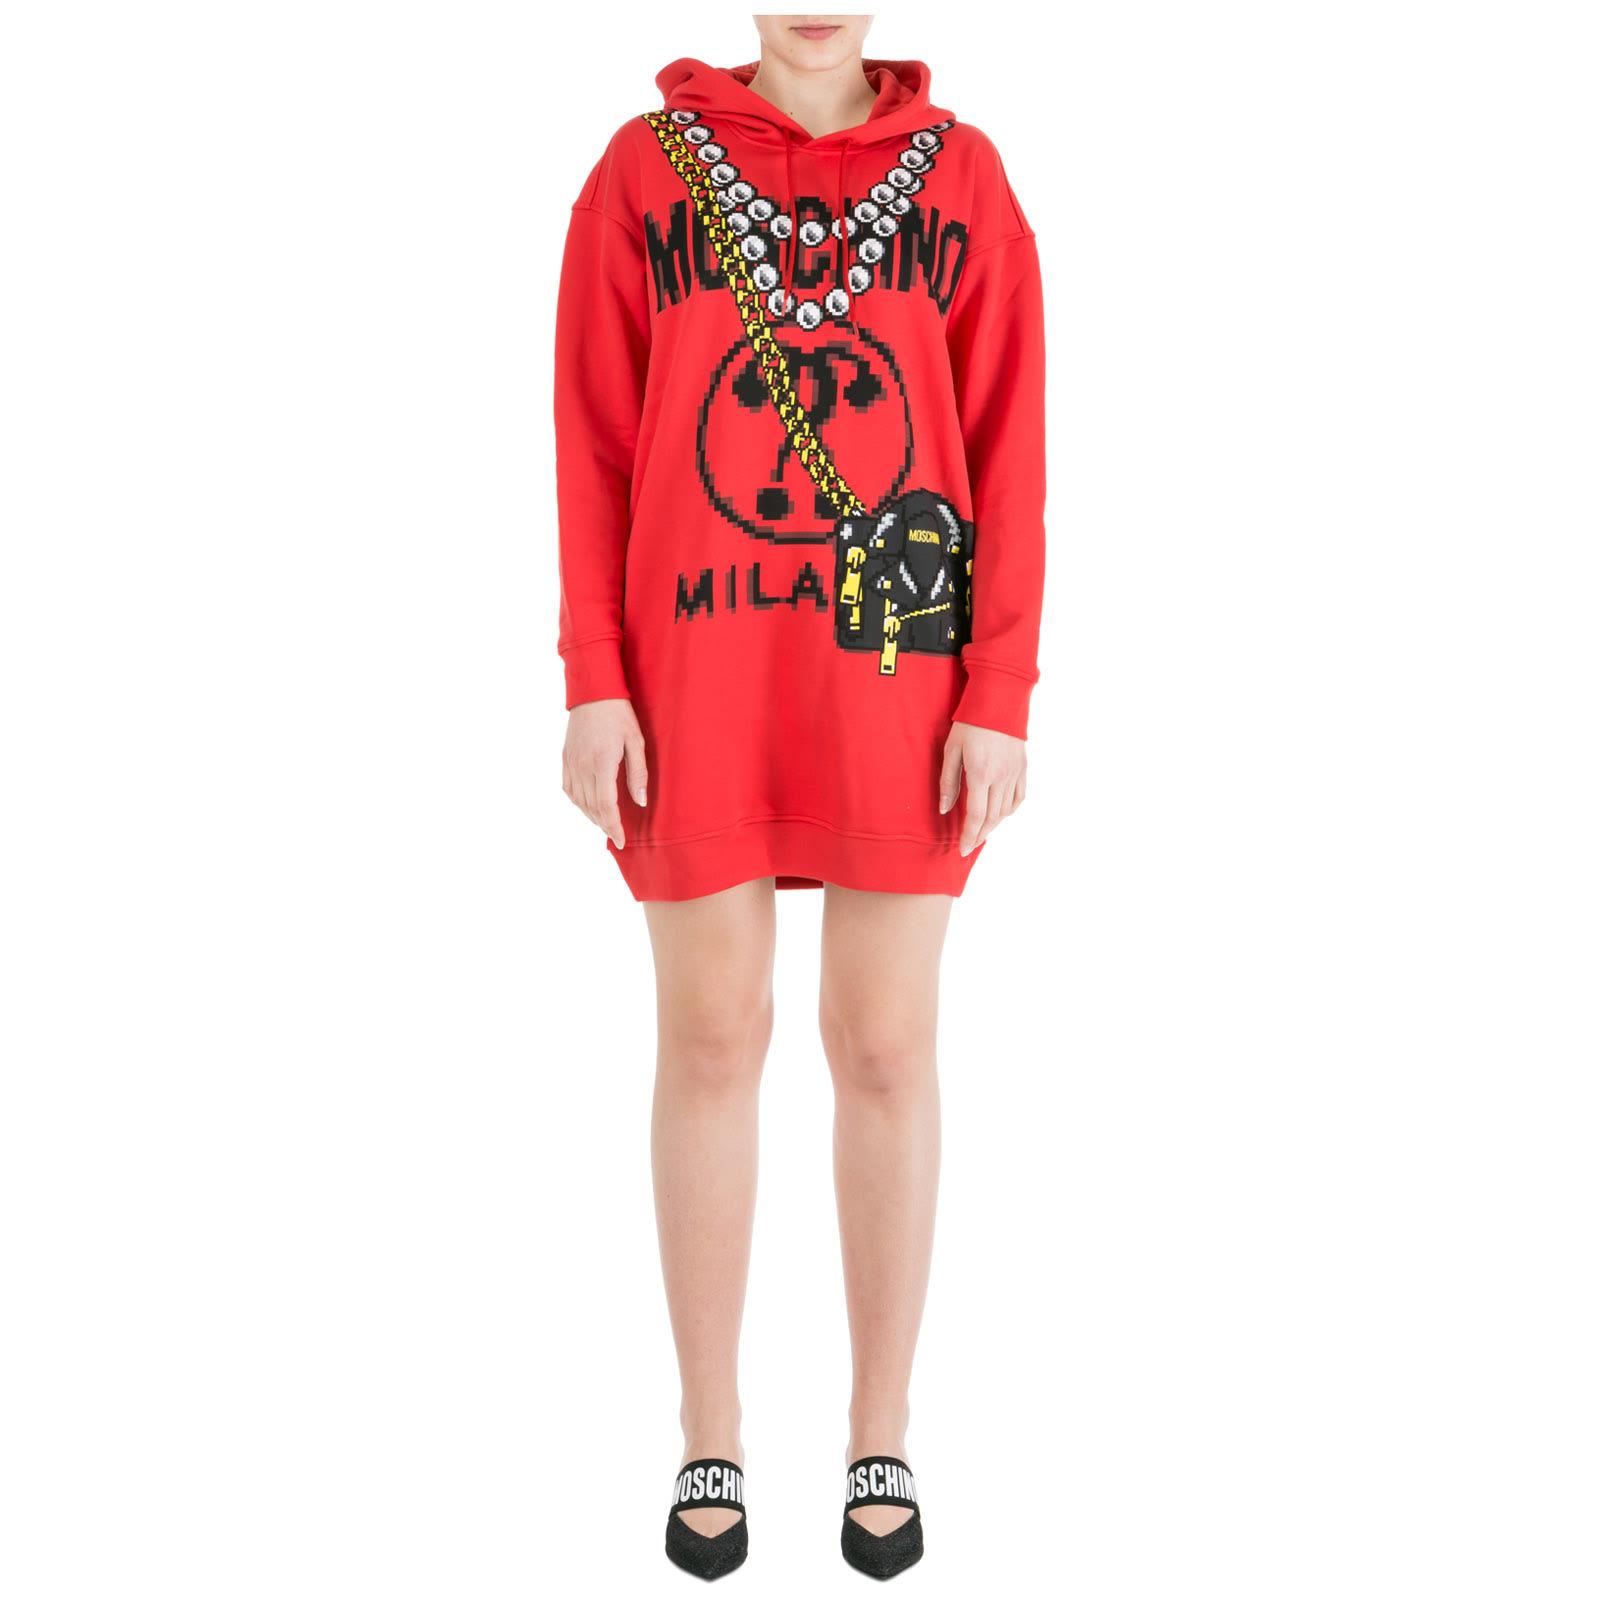 Moschino Sweatshirt Dress Pixel Capsule